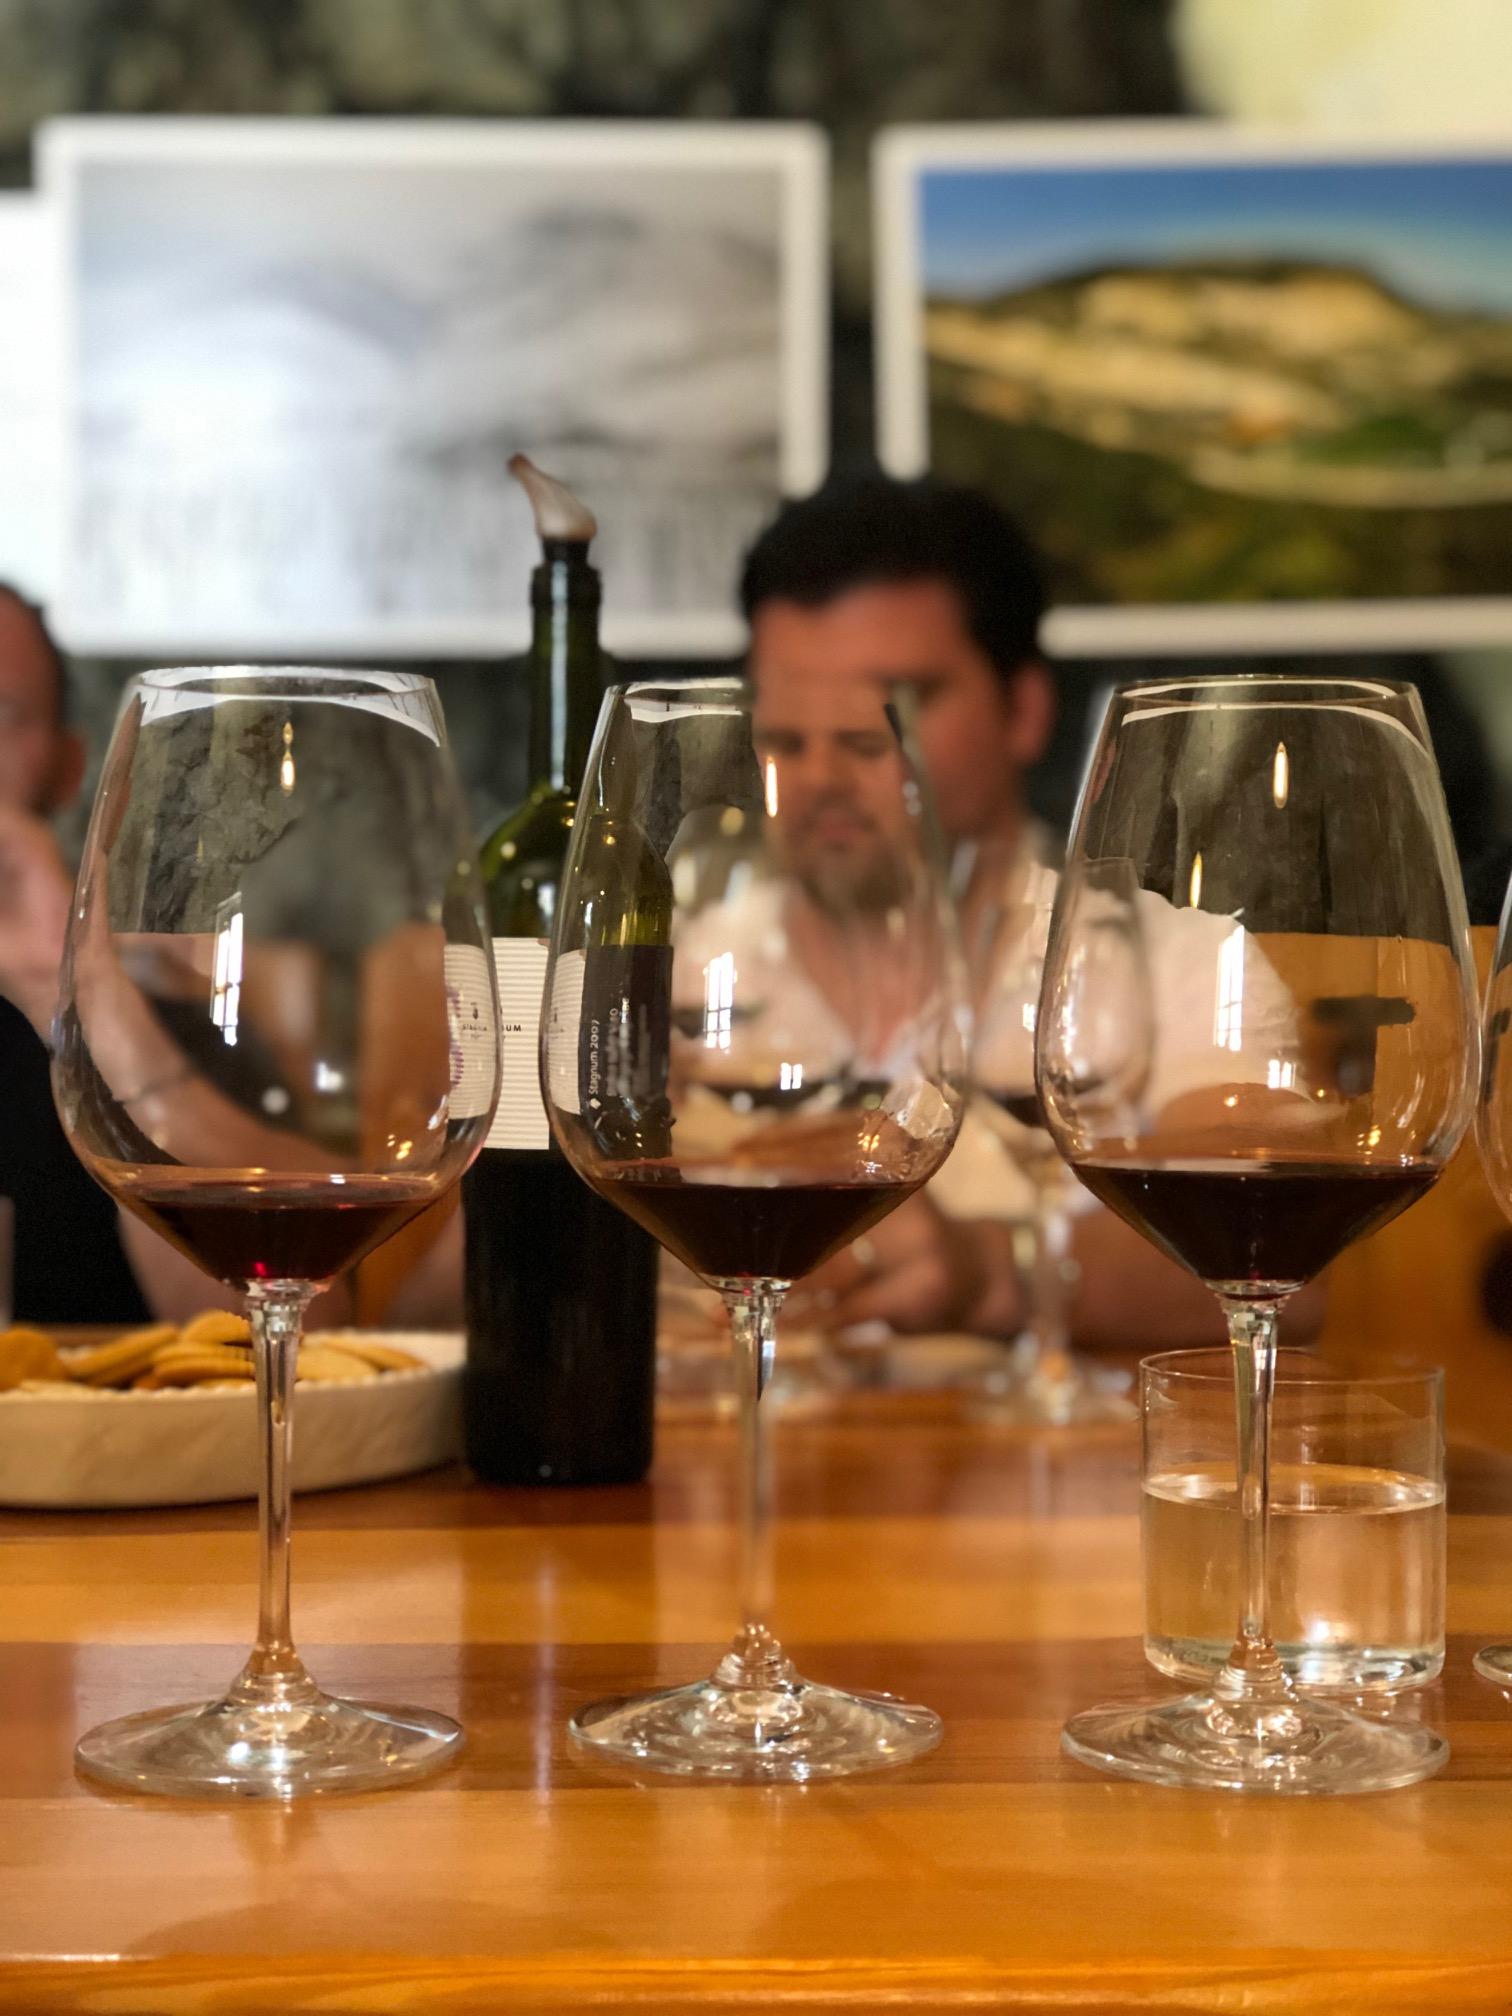 milos winery, croatia